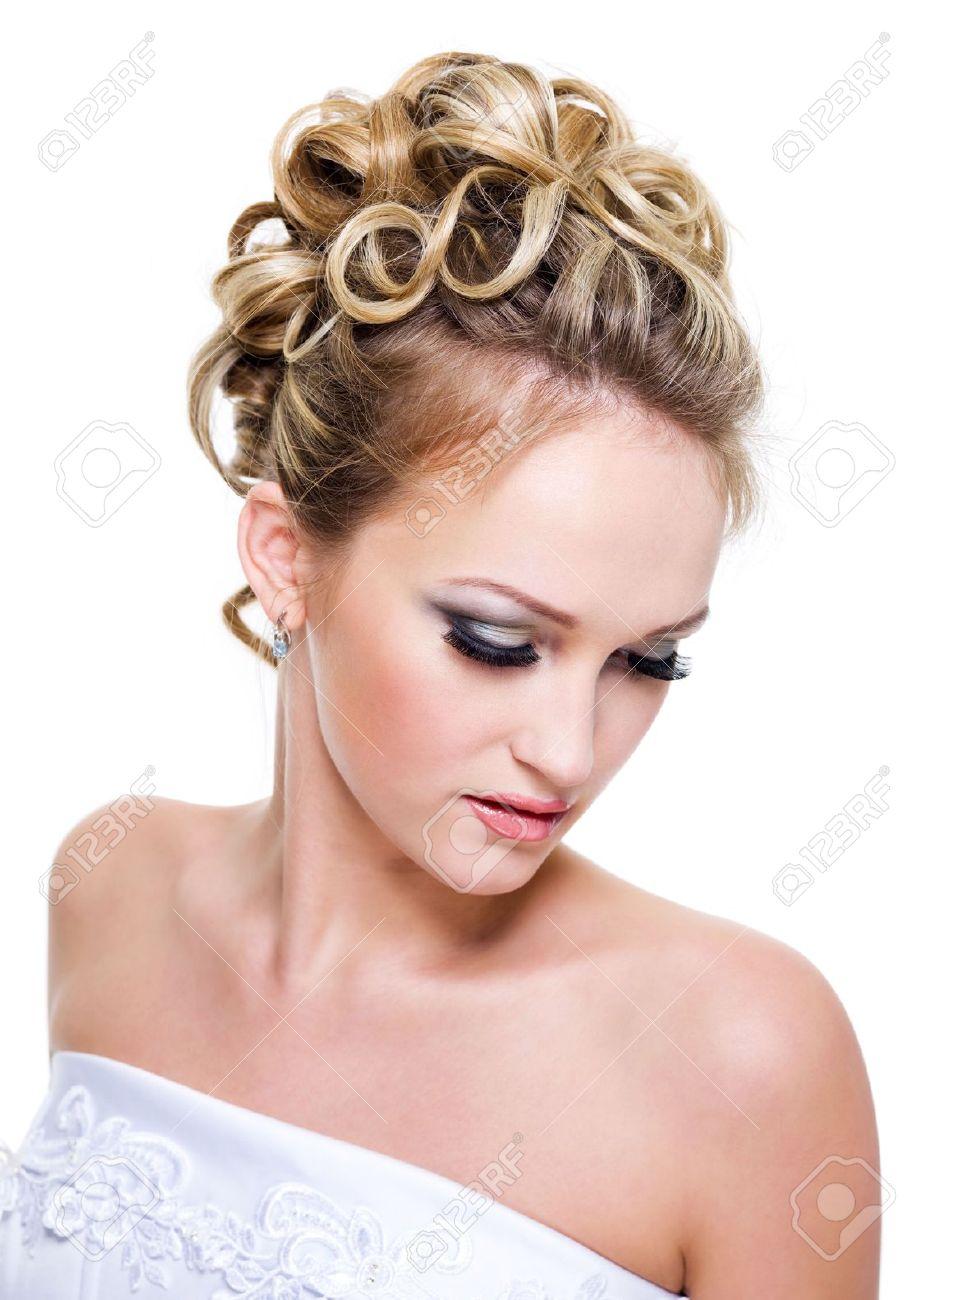 Beautiful bride with fashion wedding hairstyle -  on white background Stock Photo - 6582084